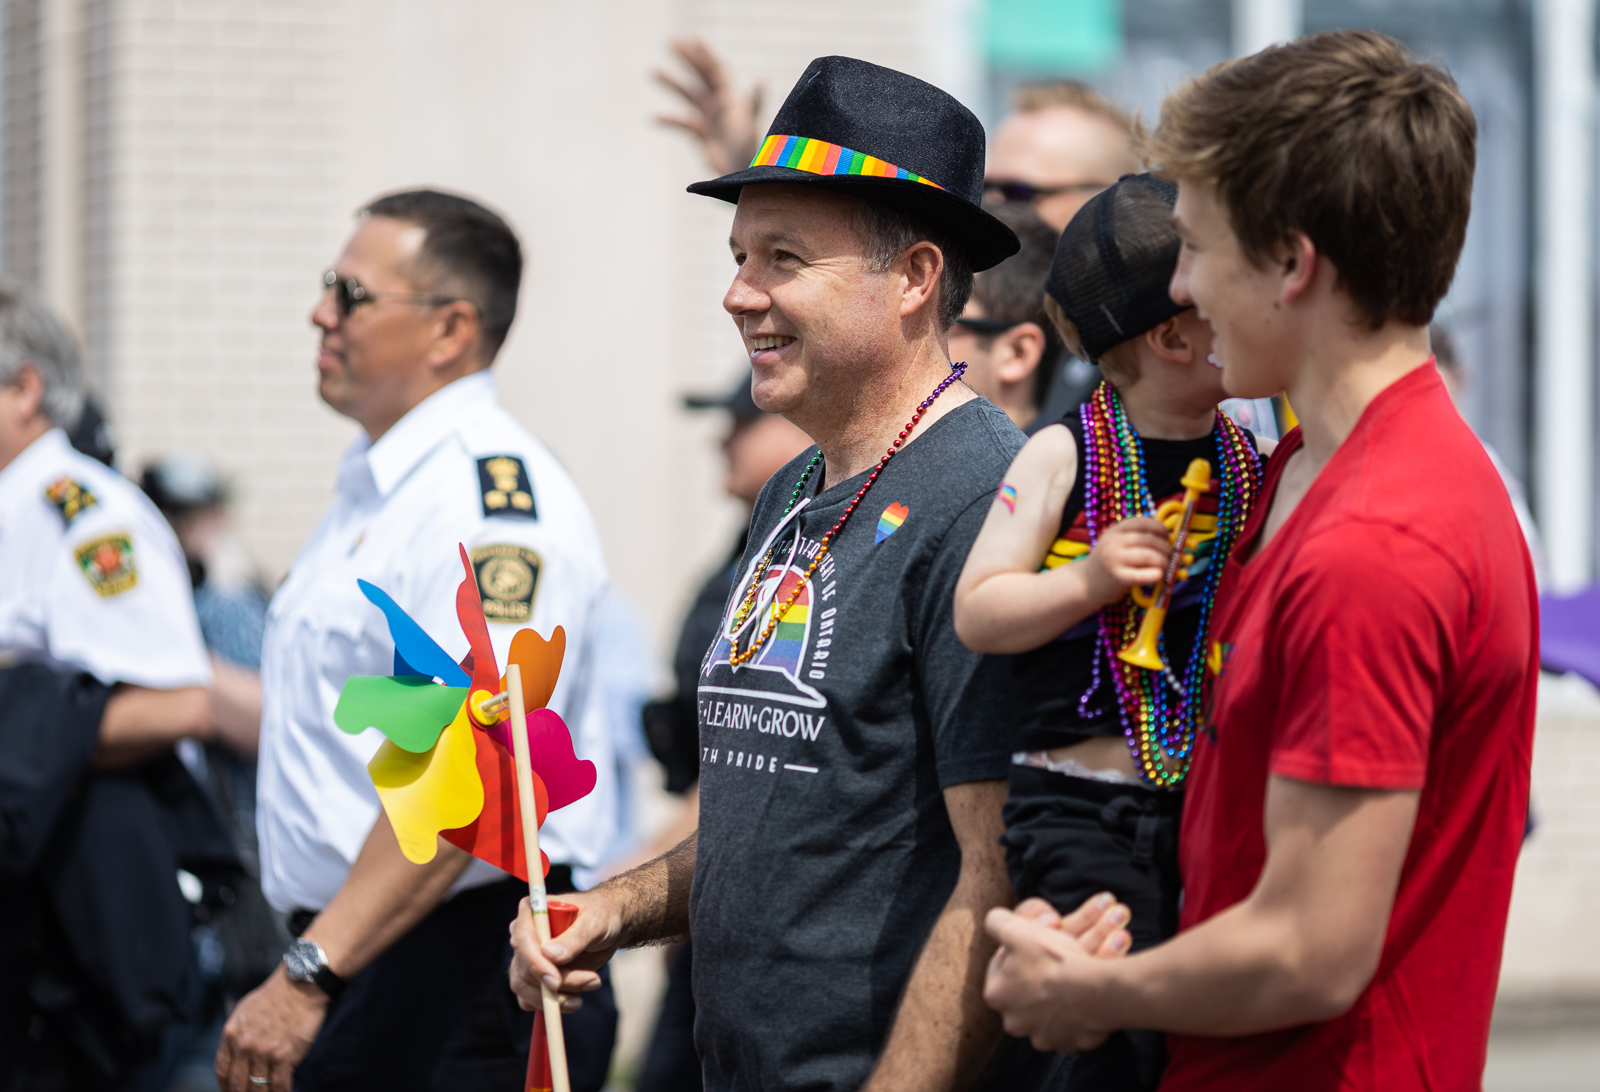 pride-parade-2019-fb-21.jpg